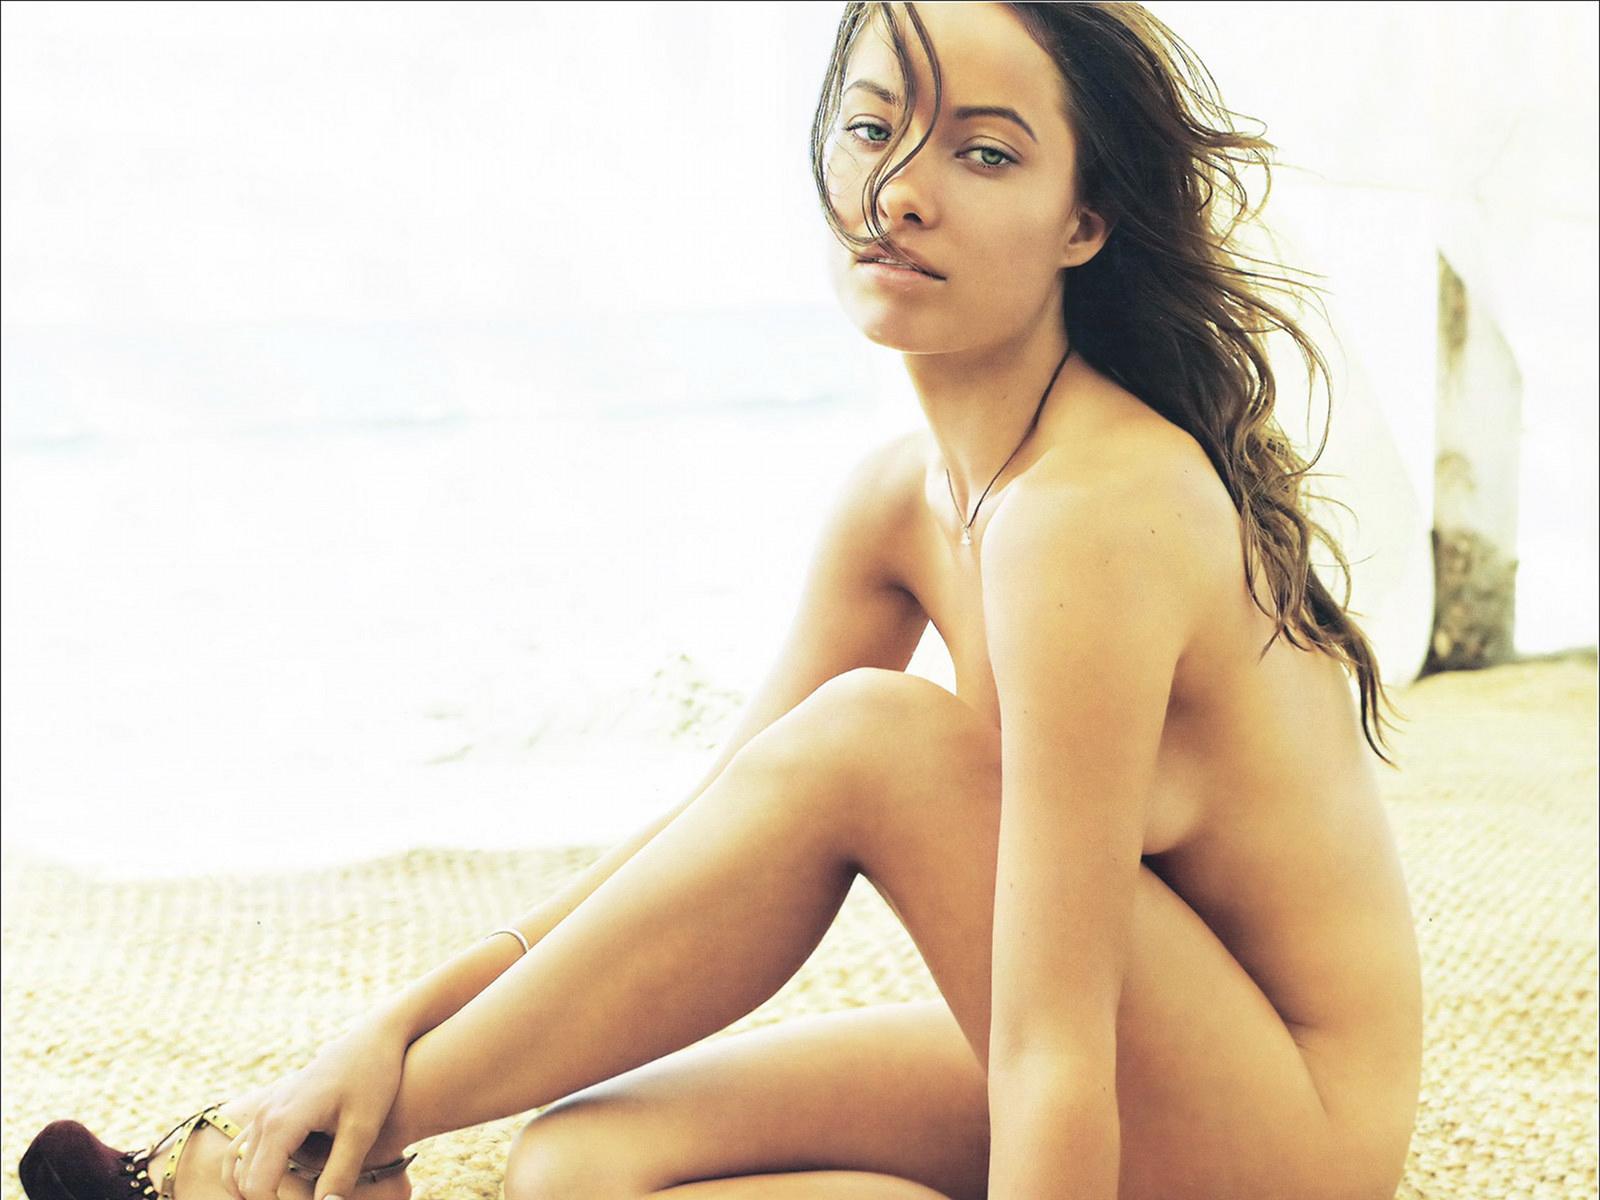 Malika Mnard nue : les vraies photos sexy de Miss France